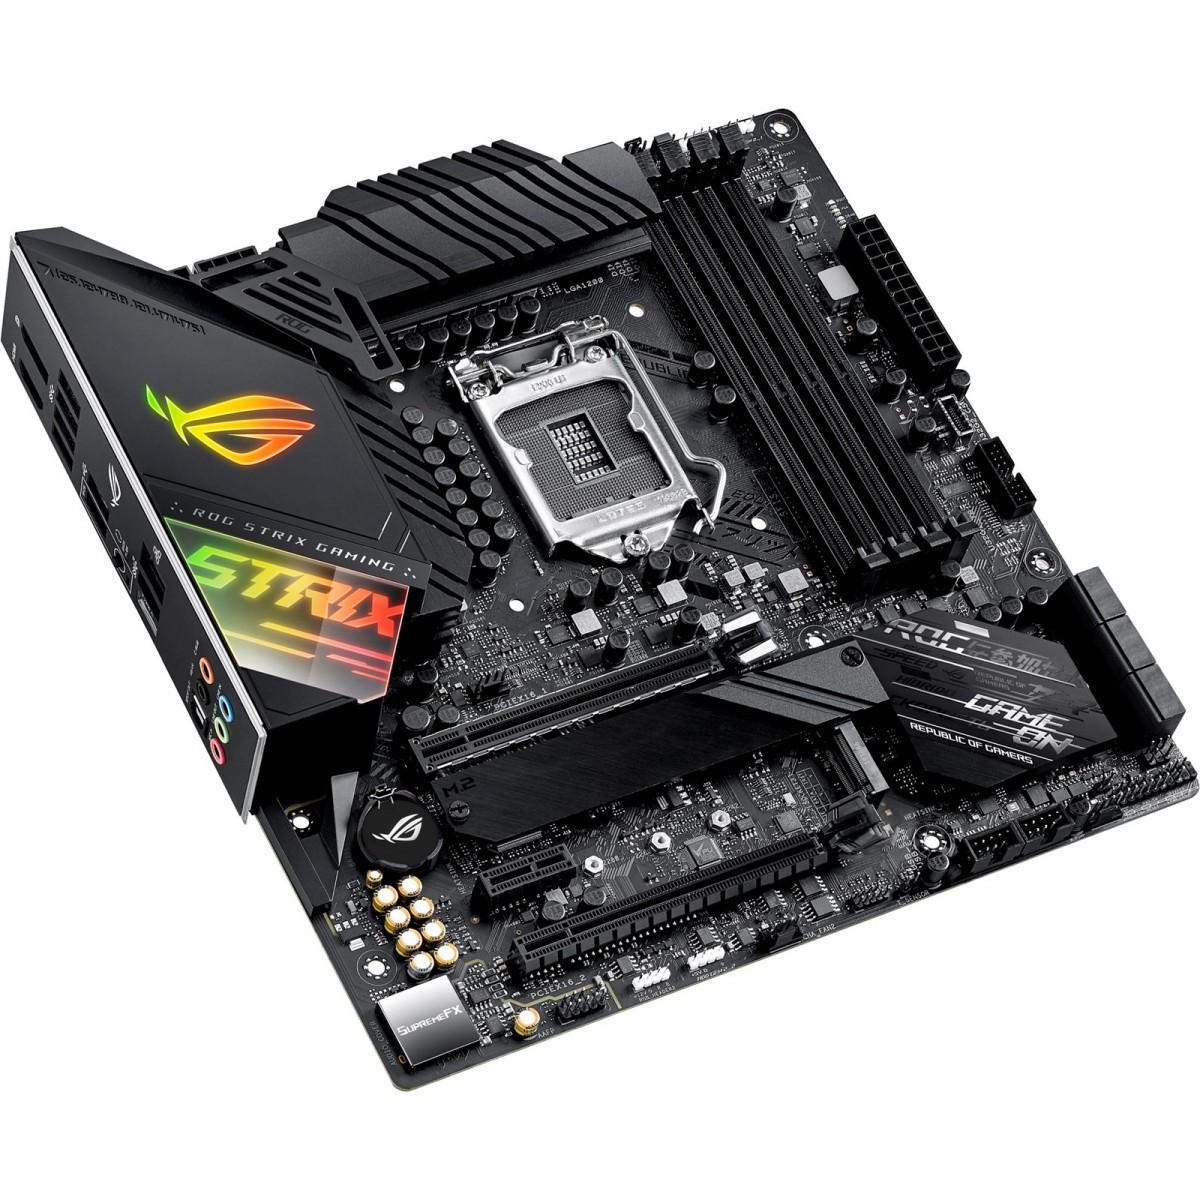 Placa Mãe Asus Rog Strix Z490-G Gaming, Chipset Z490, Intel LGA 1200, mATX, DDR4